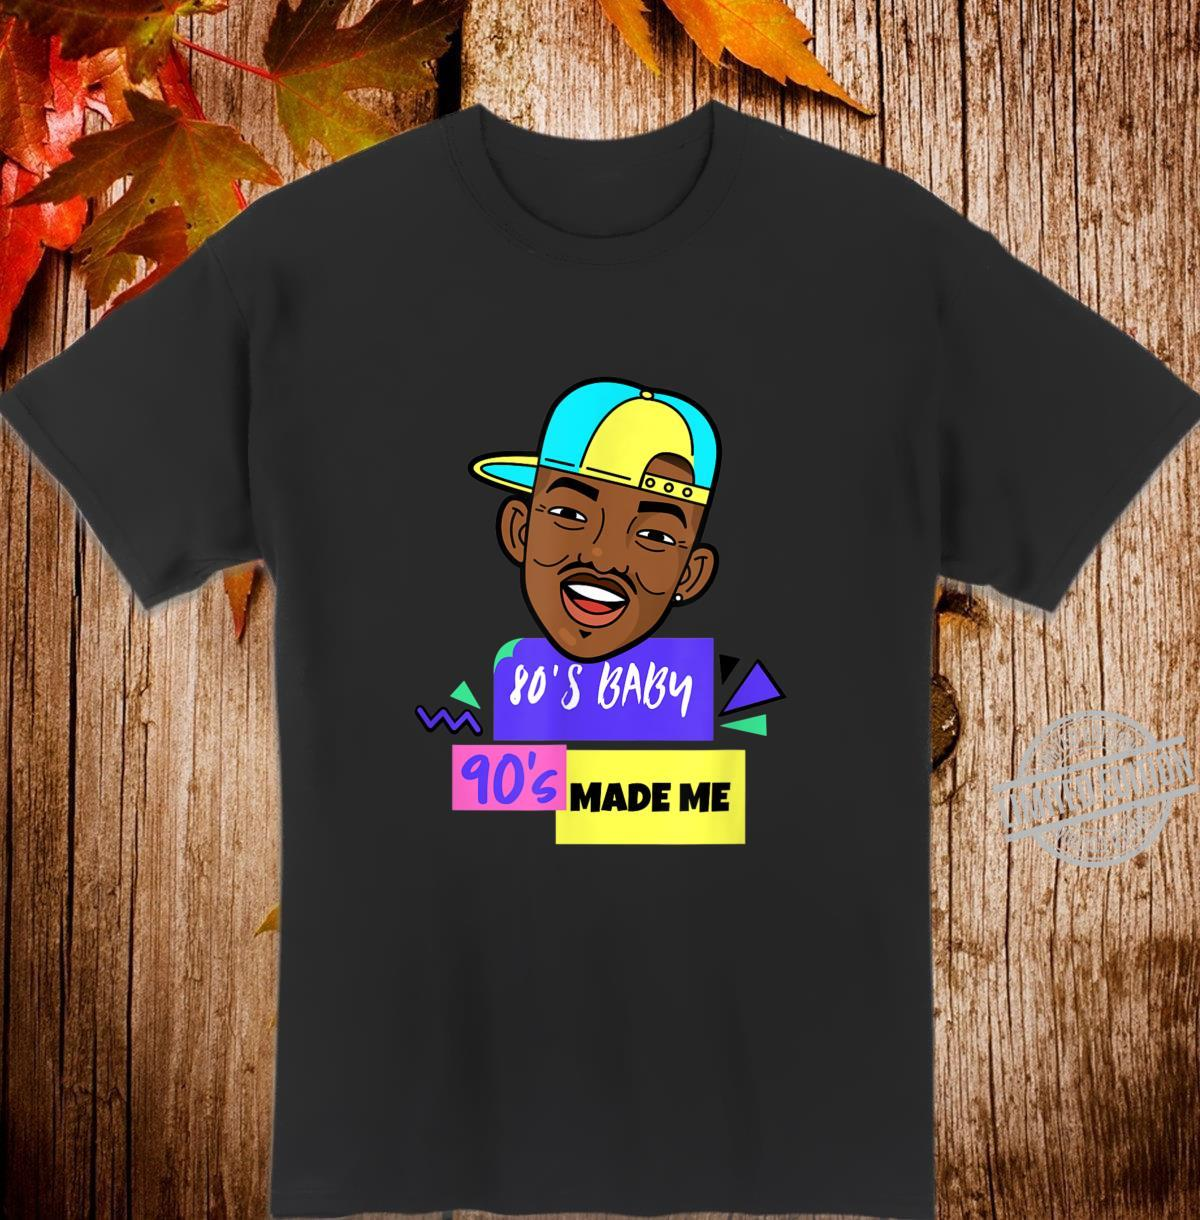 Retro Street 80's Baby 90's Made Me 1980s & 1990s Shirt